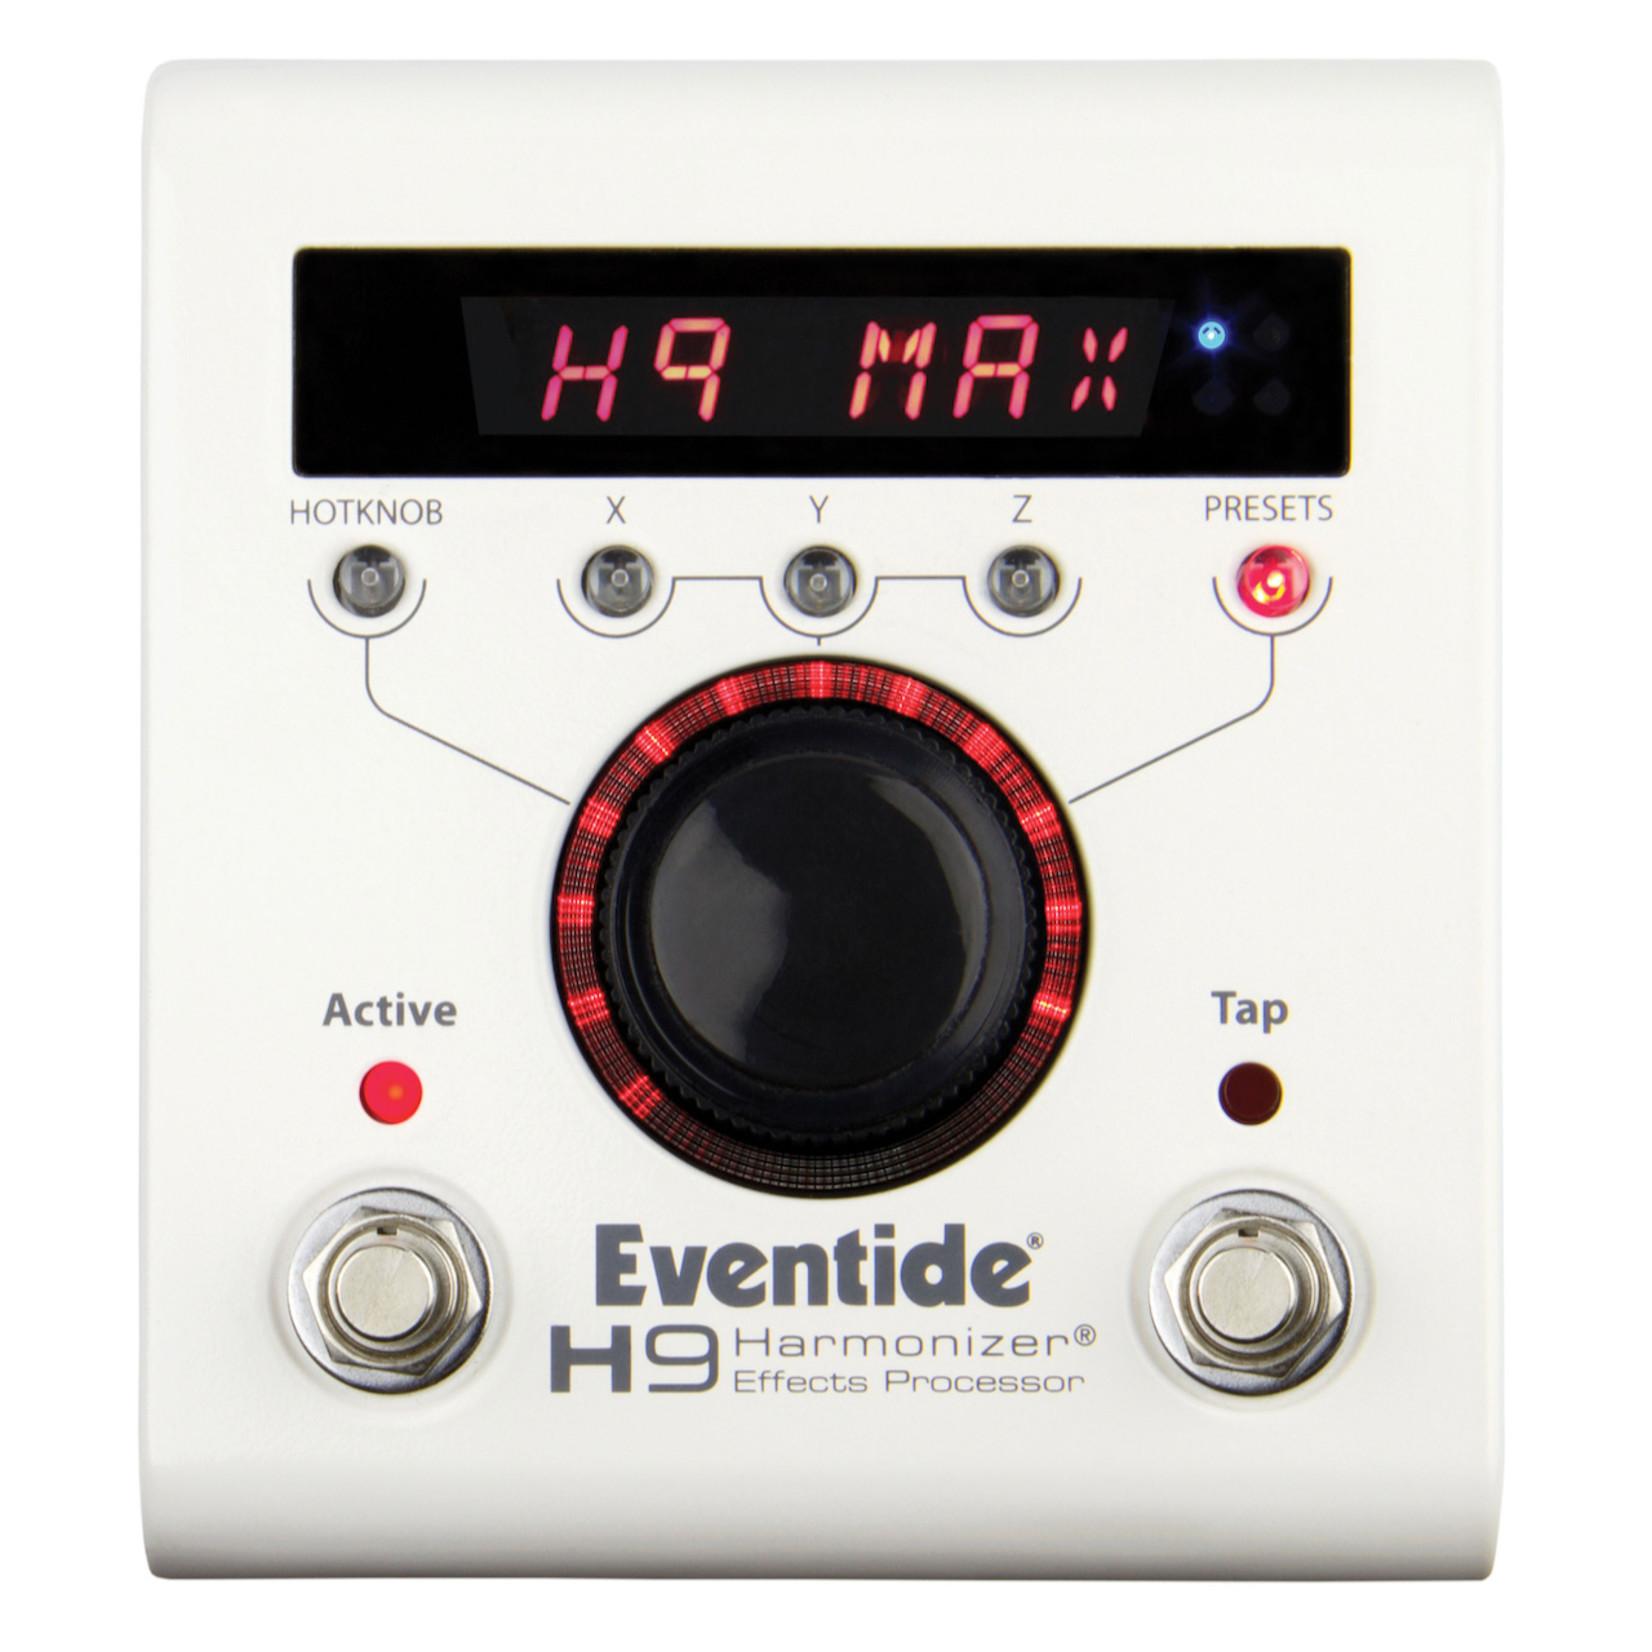 Eventide Eventide H9 MAX Harmonizer Effects Processor with Wireless Control